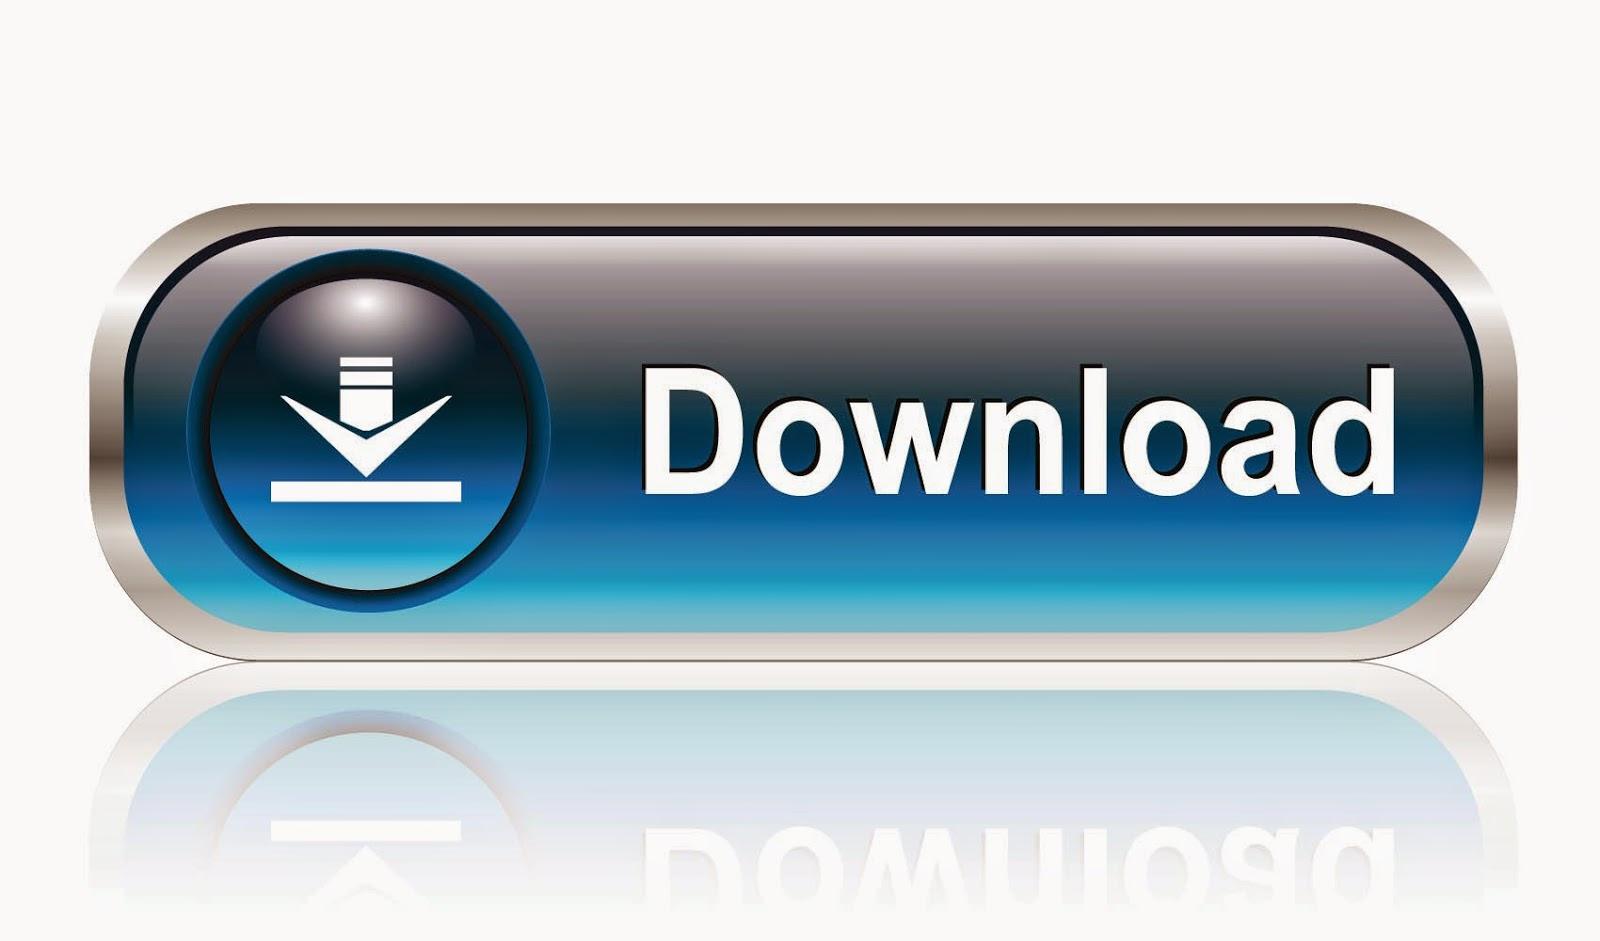 "<img src=""http://4.bp.blogspot.com/-RQihPJ3fzJ8/U2fE_GyJ4qI/AAAAAAAACjM/YZg2j7rYjcc/s1600/WIFI-Scan.jpg"" alt=""WIFI Scan Apk Free Download"" />"